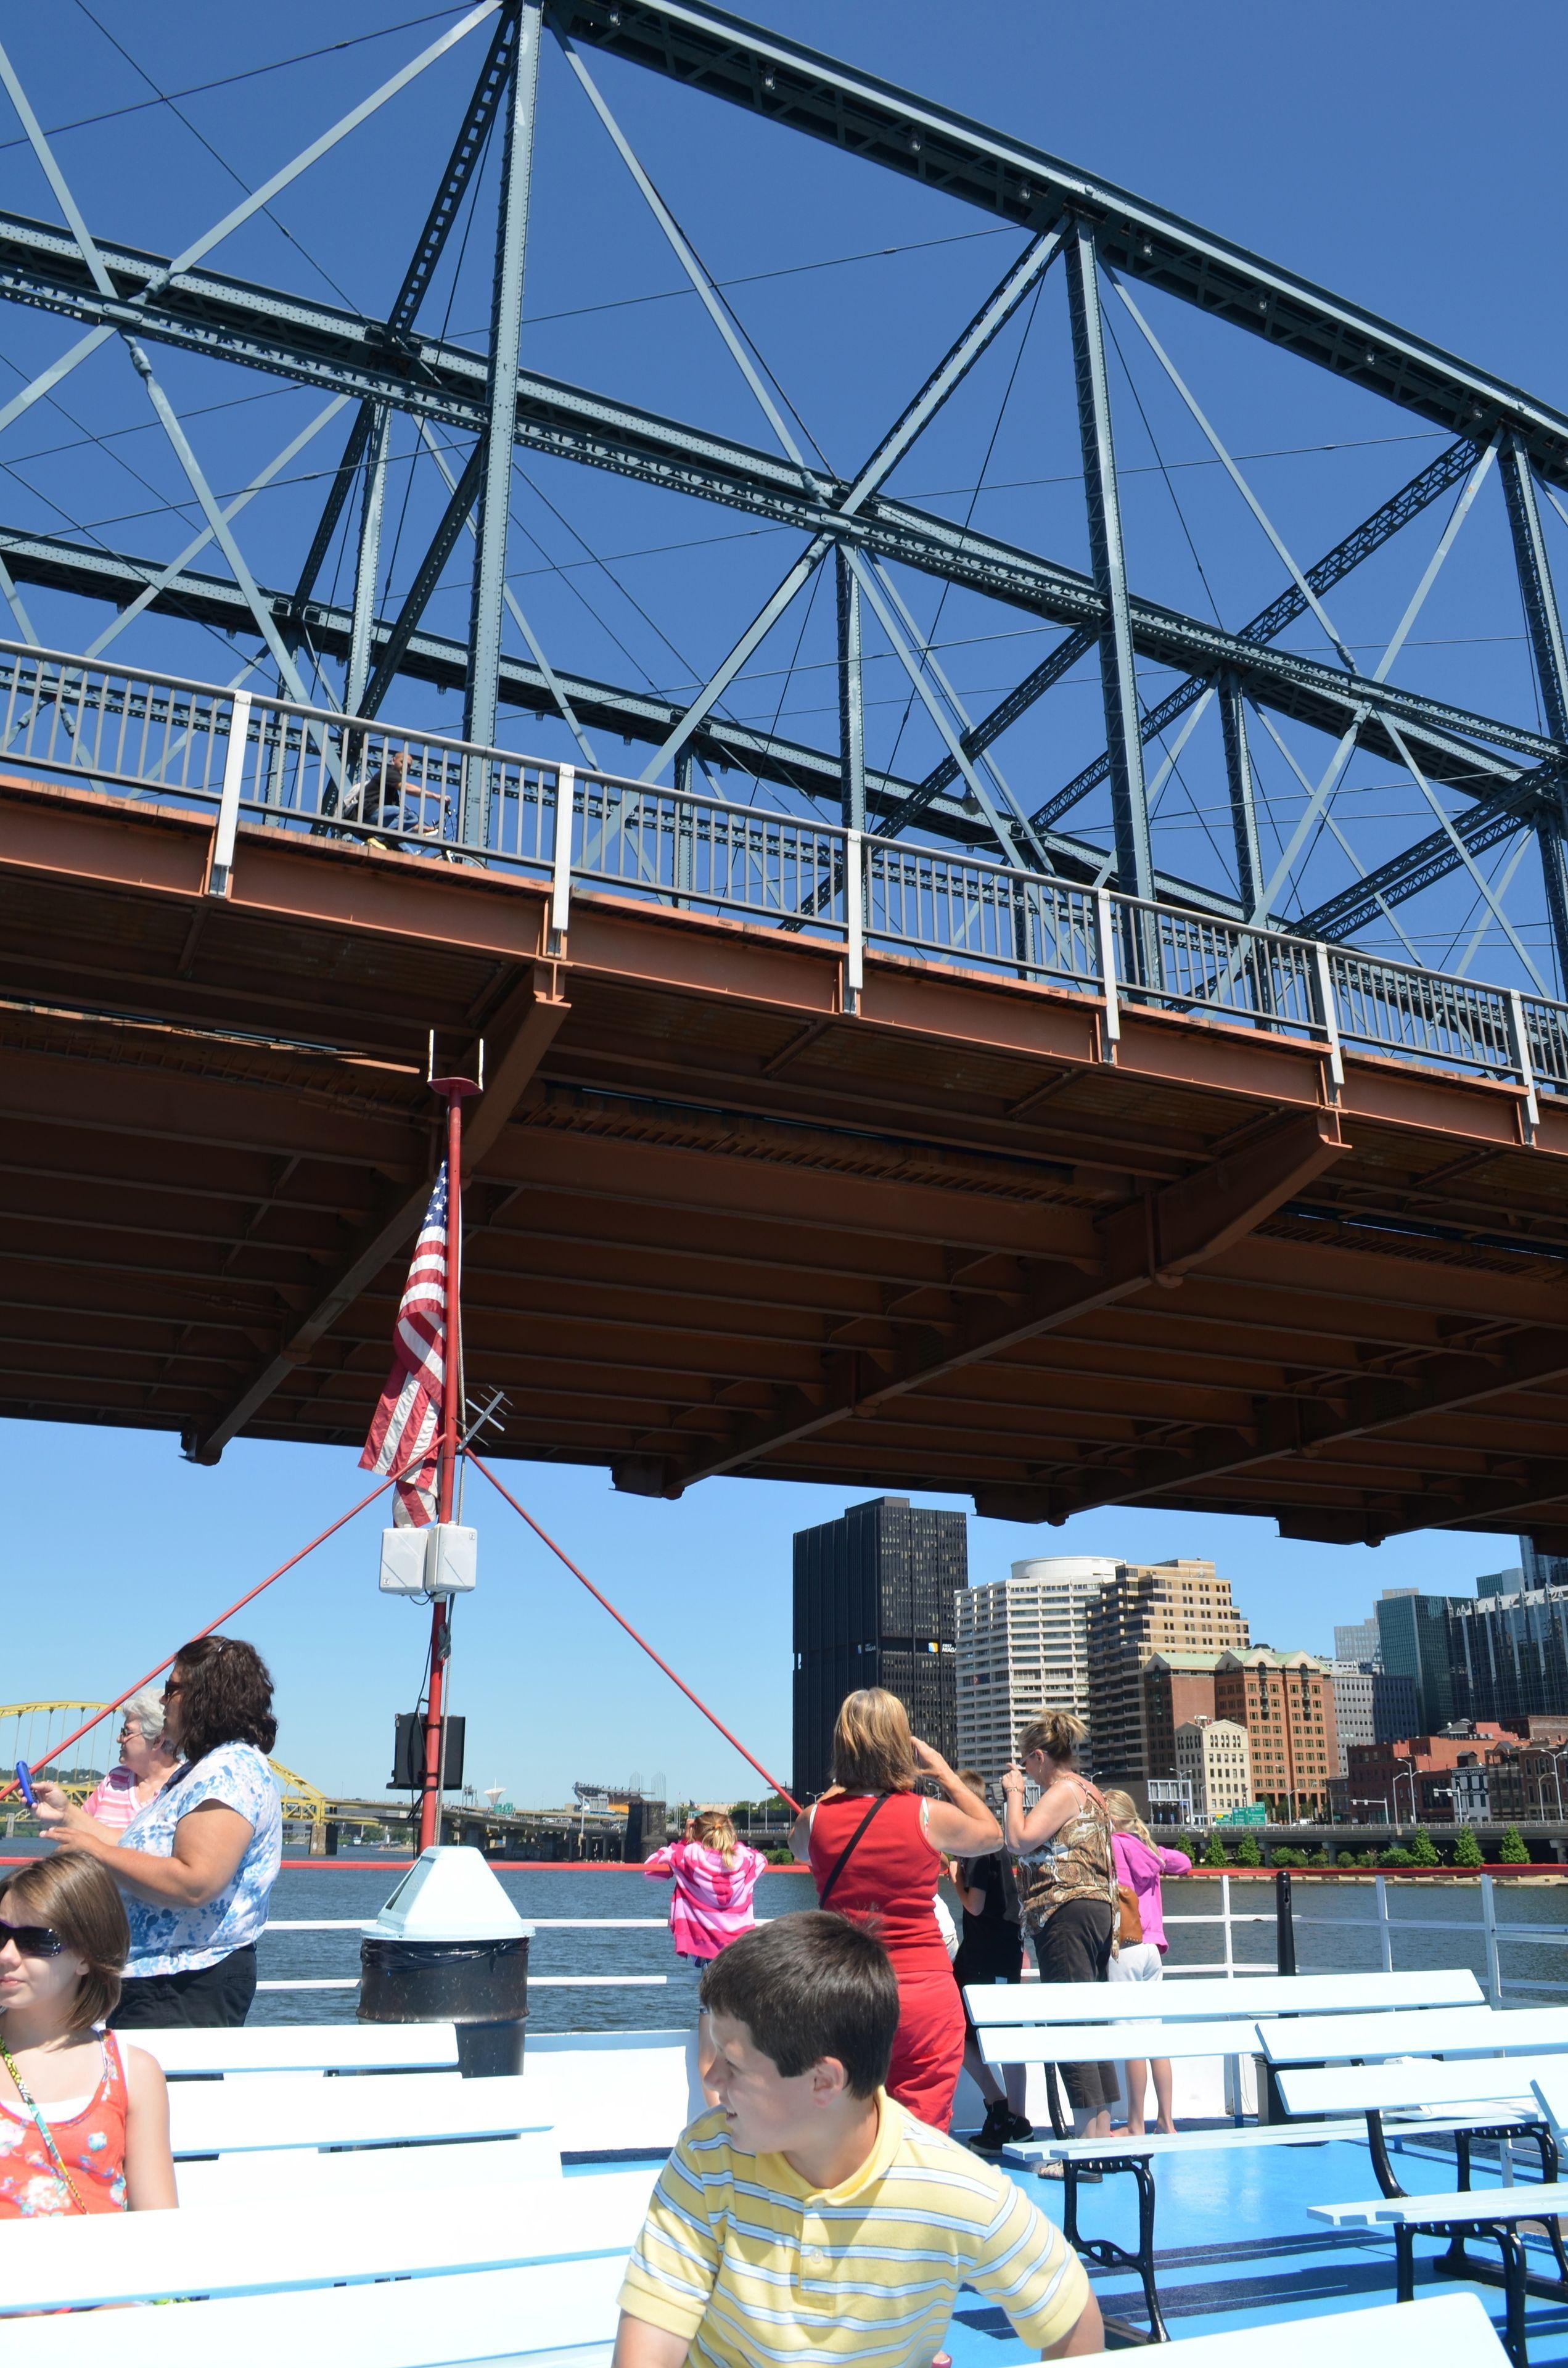 River boat traveling under bridge in Pittsburgh